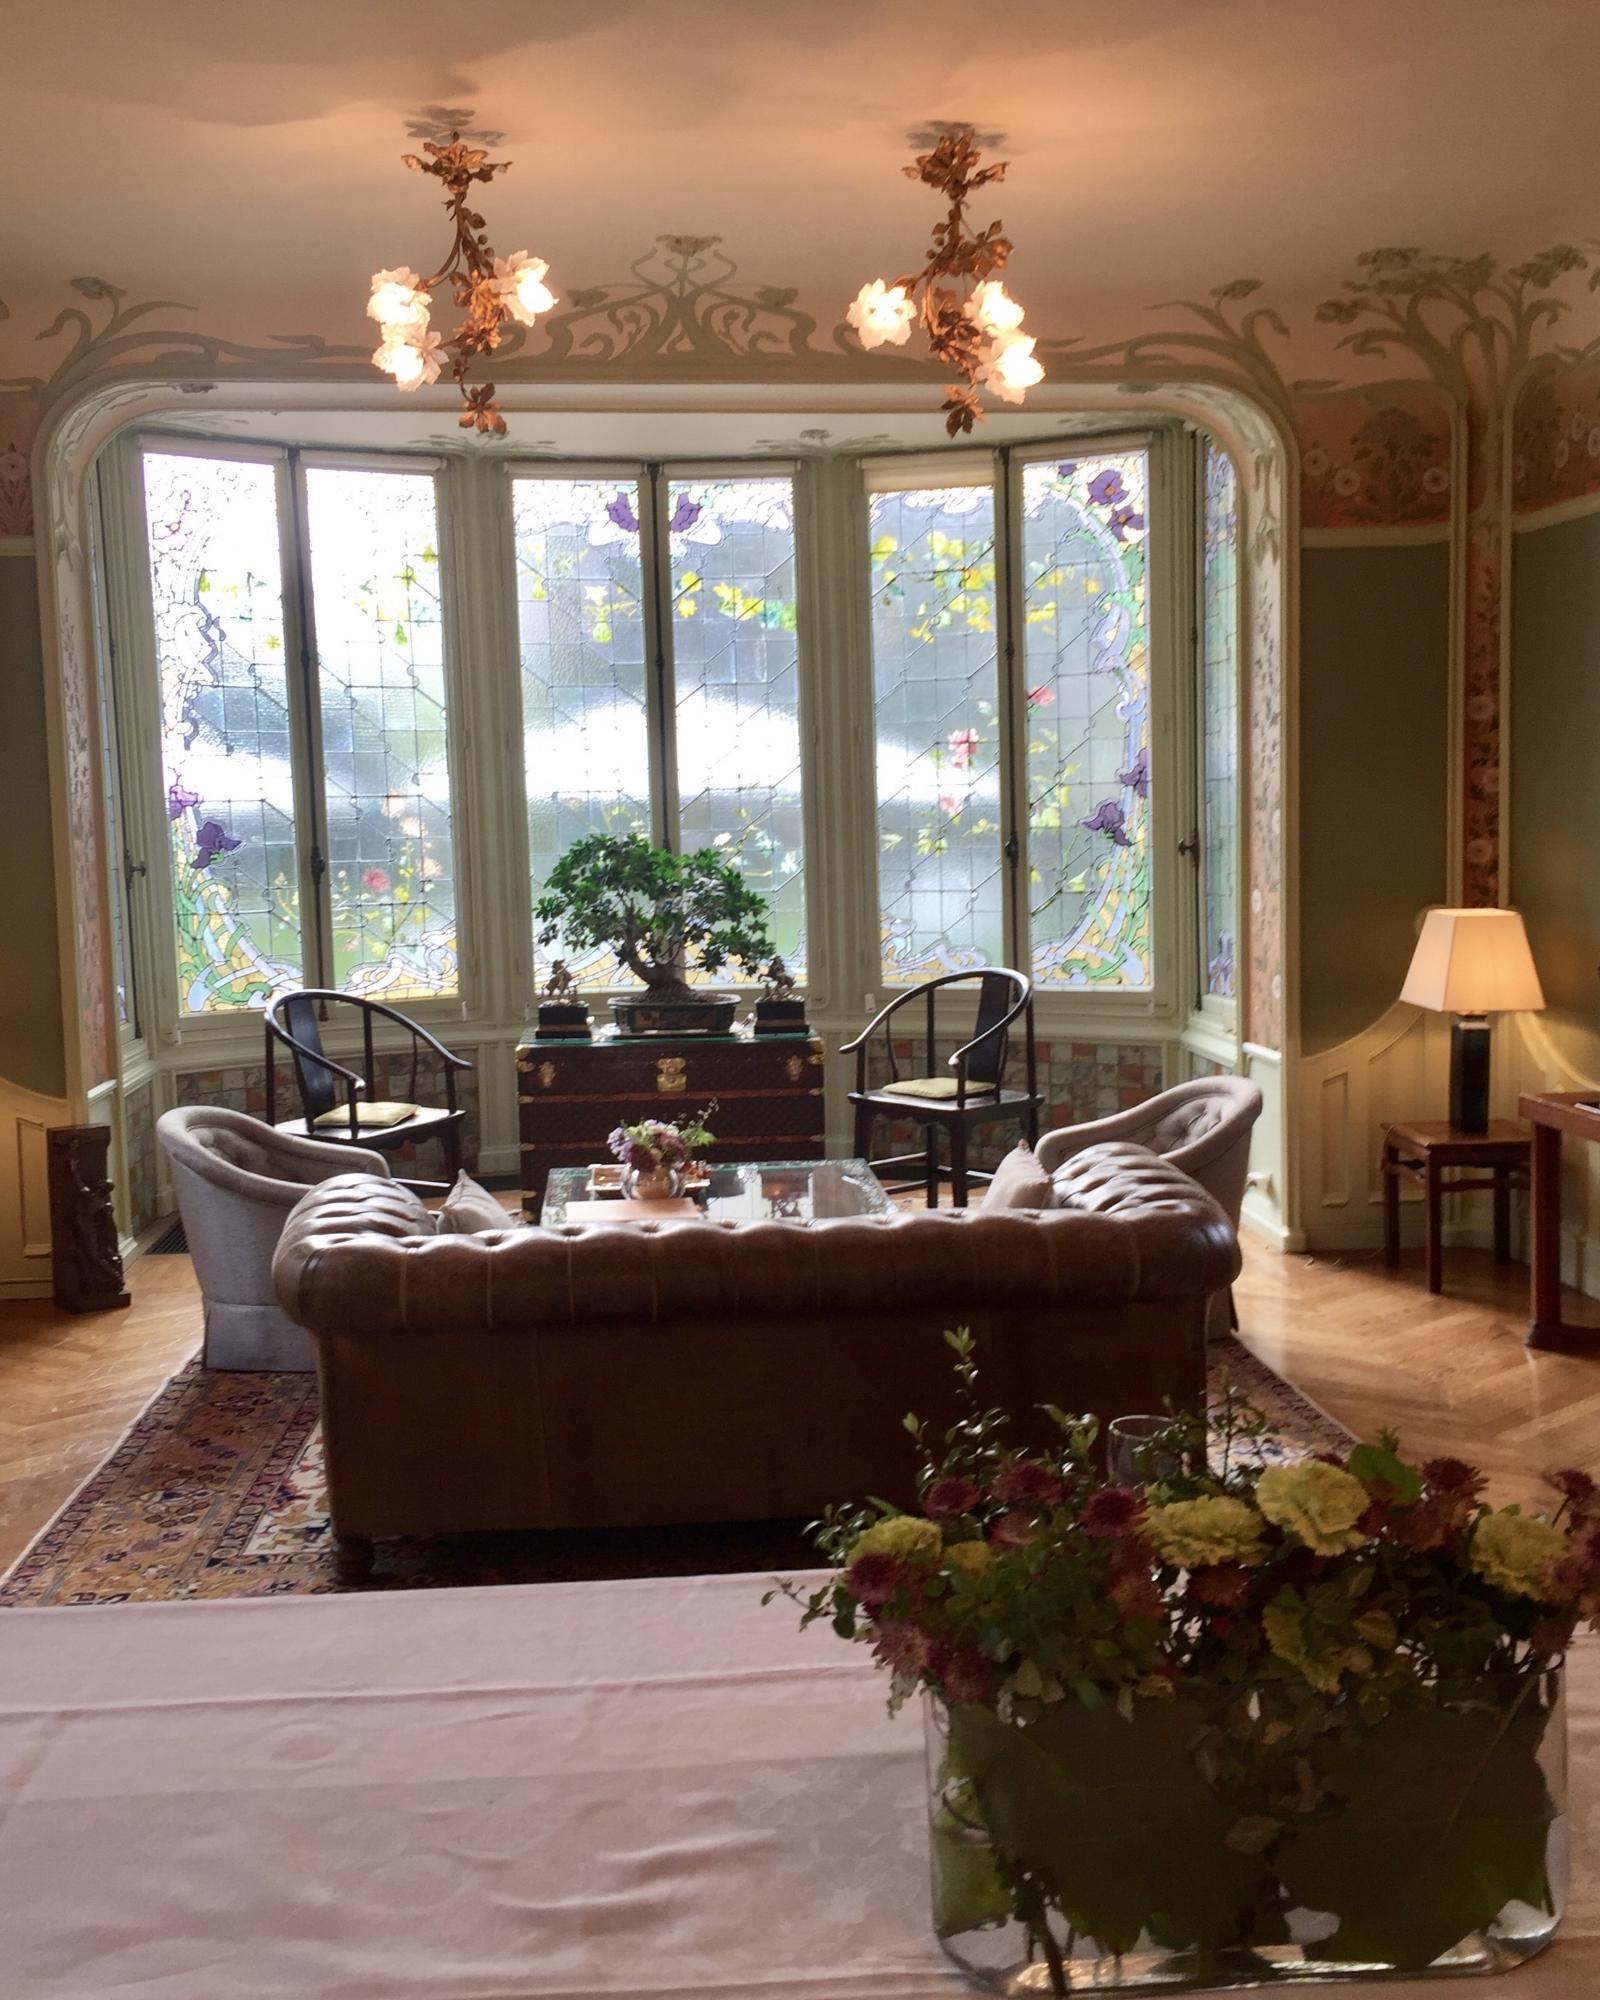 Glamorous Living - Five Days in Paris - Doreen Chambers Top Interior Designer - Brooklyn - New York - South Florida